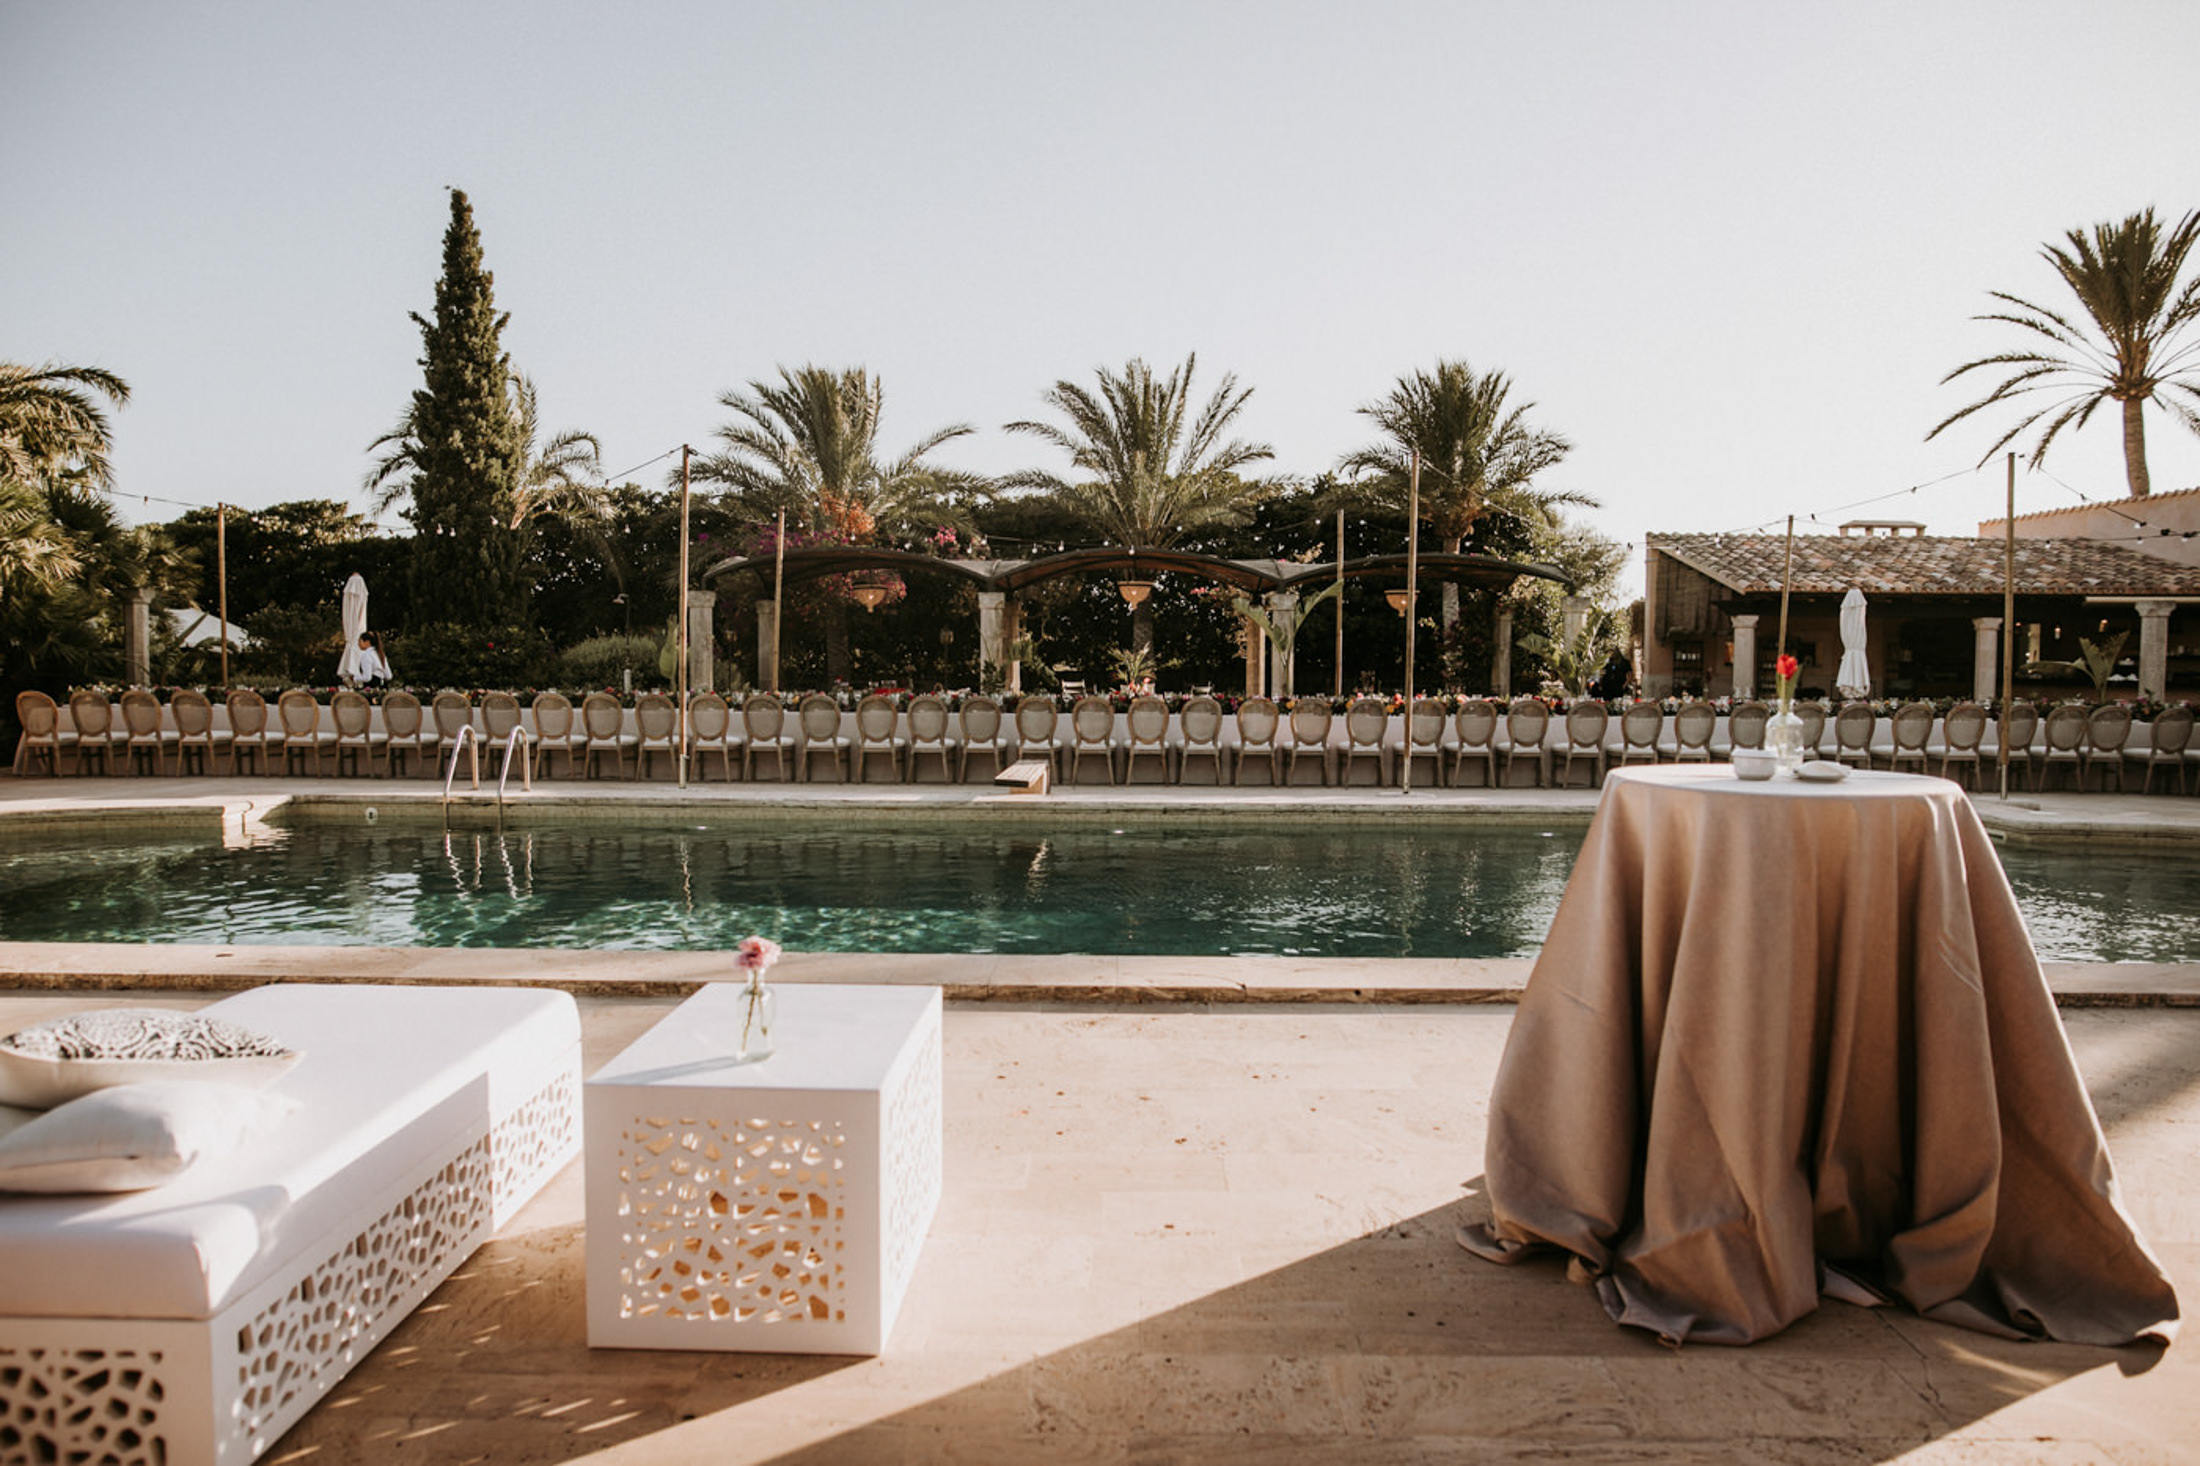 Wedding_Photographer_Mallorca_Daniela-Marquardt_Photography_New_York_Iceland_Tuscany_Santorini_Portugal_Austria_Bavaria_Elopement_Hochzeitsfotograf_AntjeRajat2_99